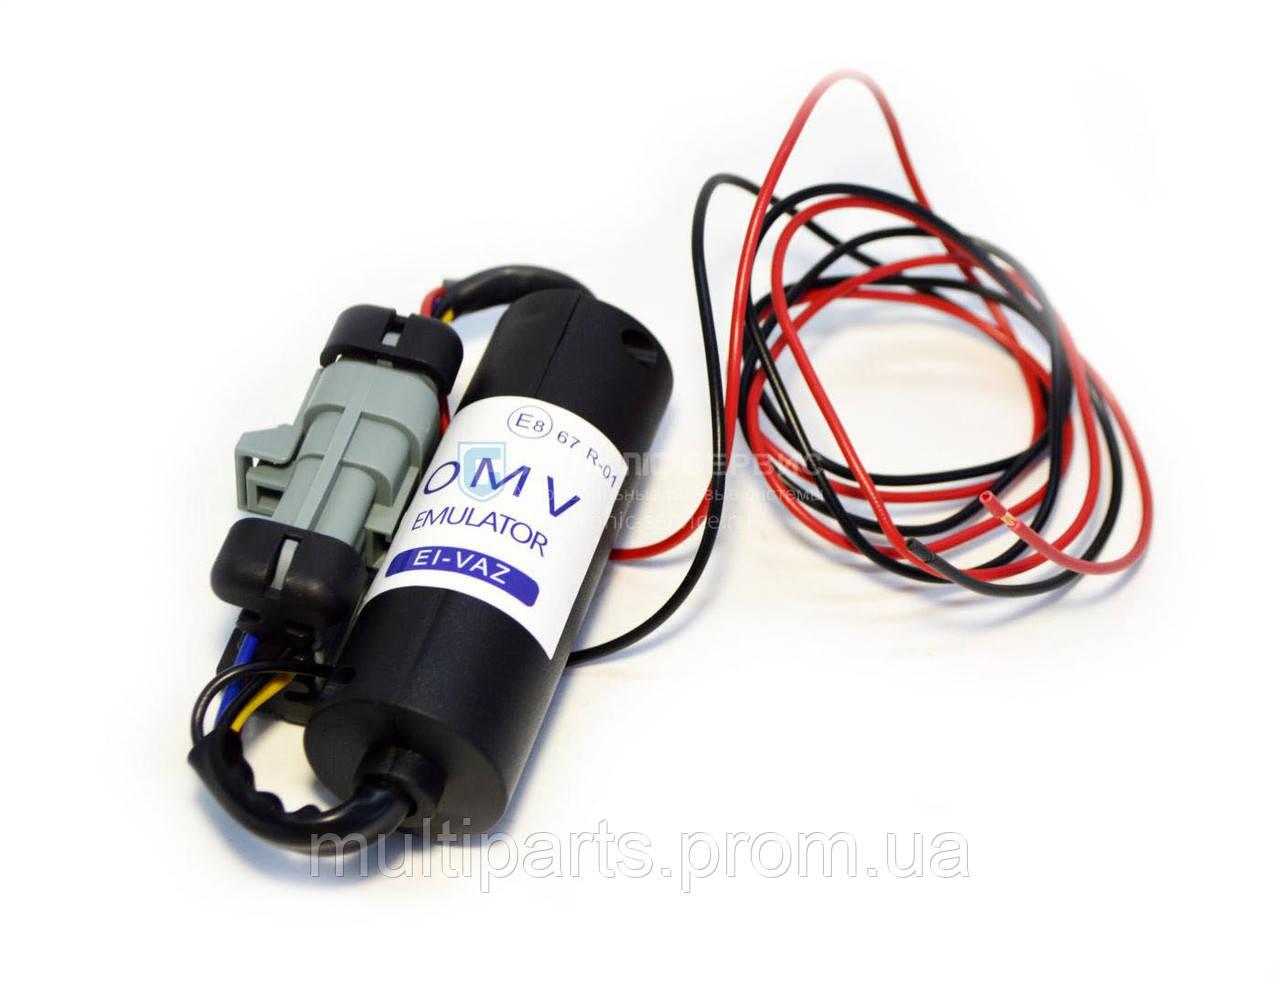 Эмулятор инжектора OMV на 4 цил. разъём ВАЗ